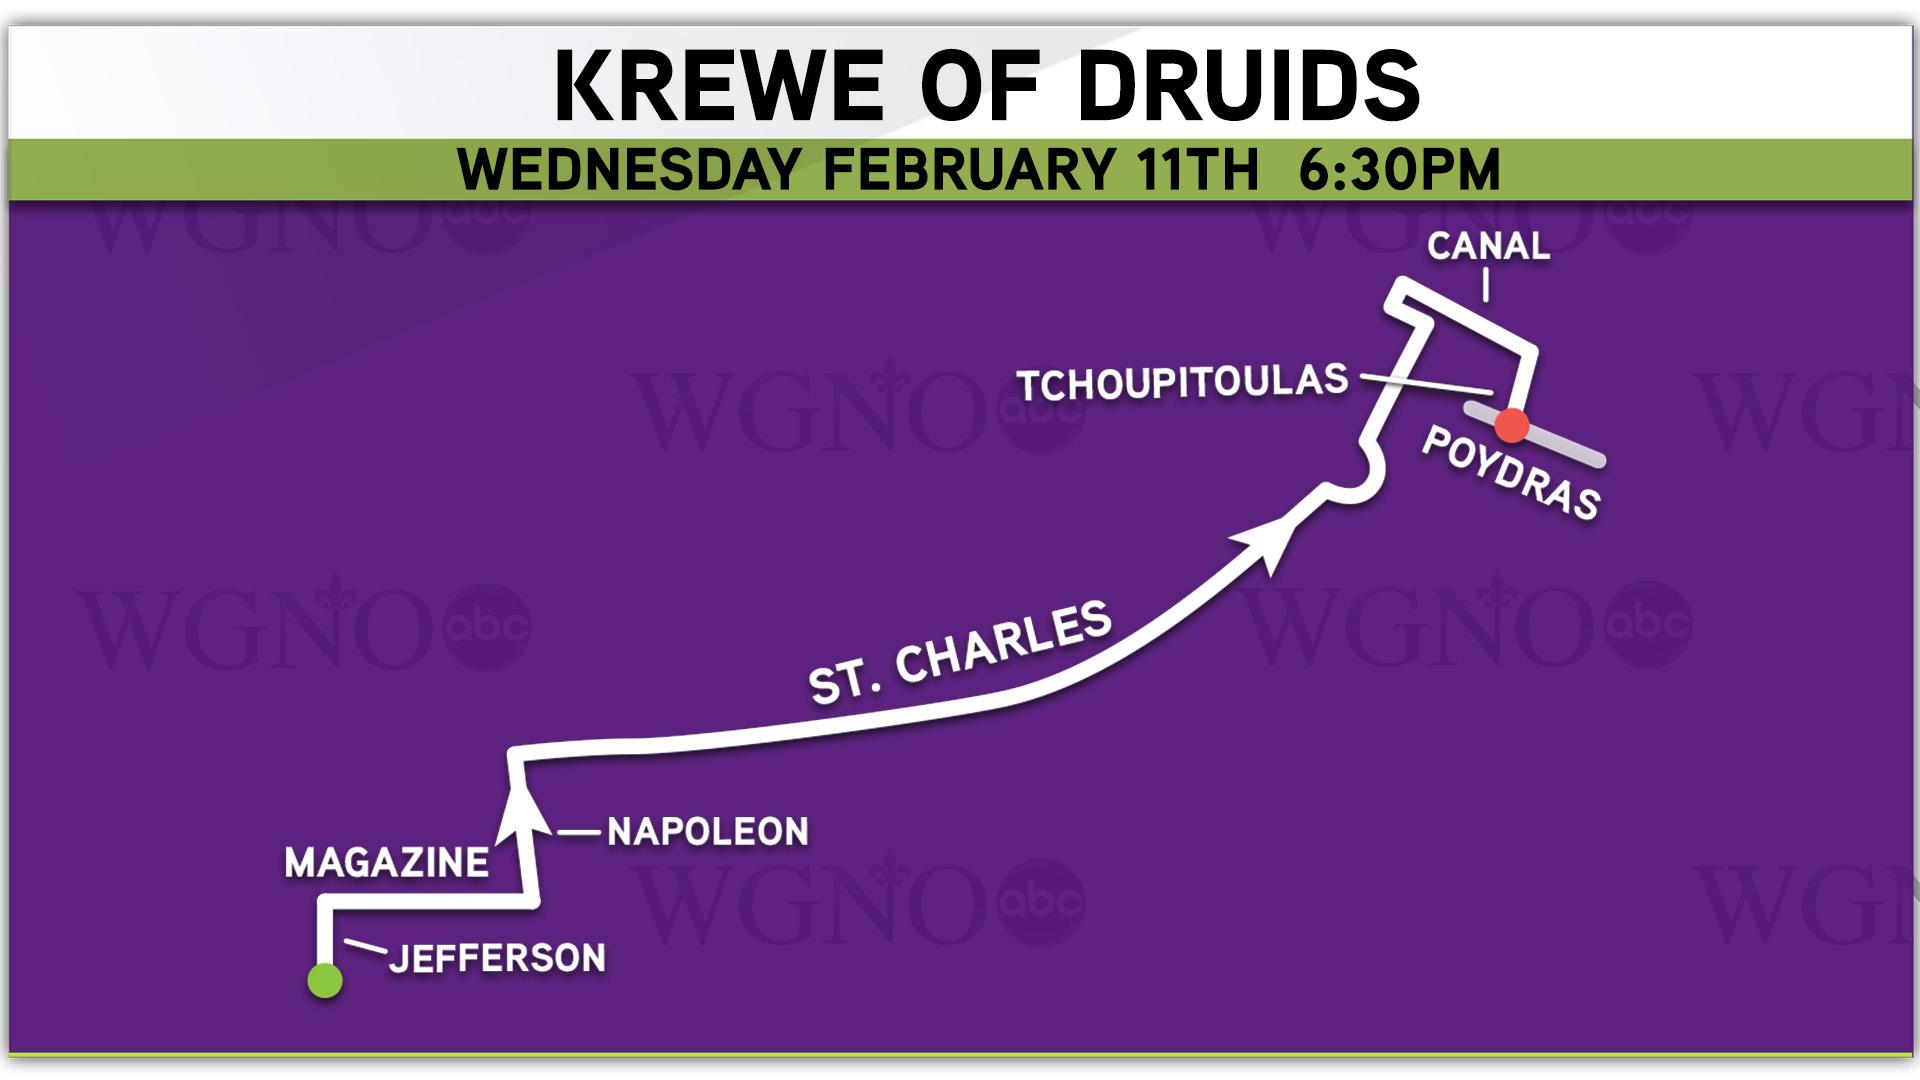 Krewe Of Druids 2015